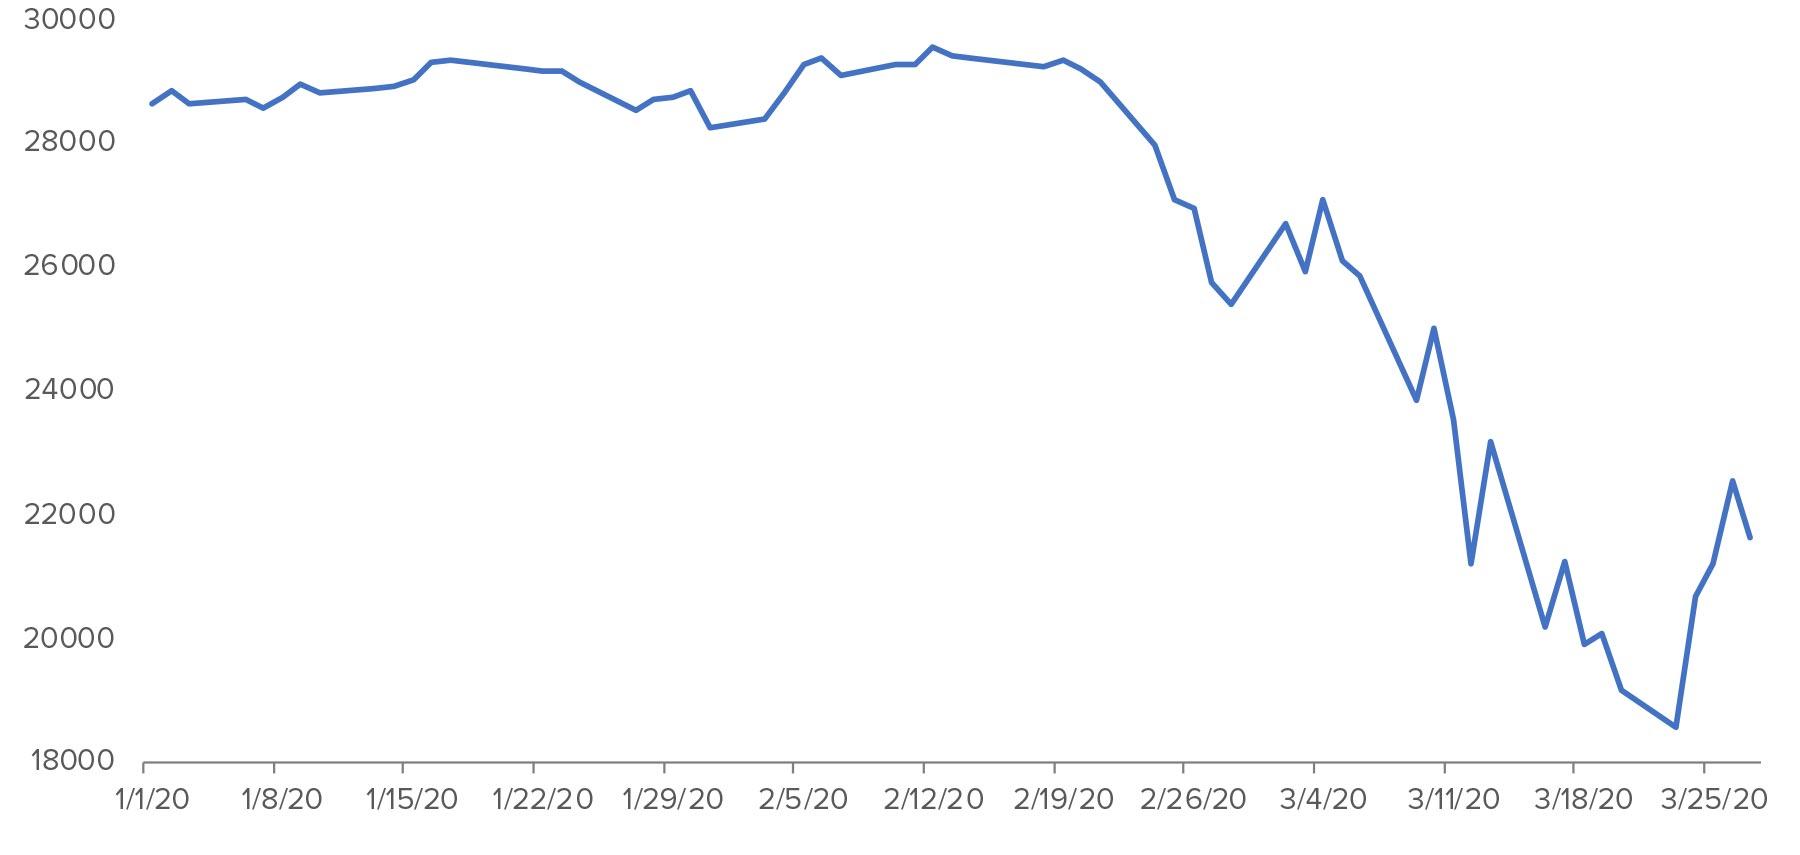 Dow Jones Industrial Average - year to date